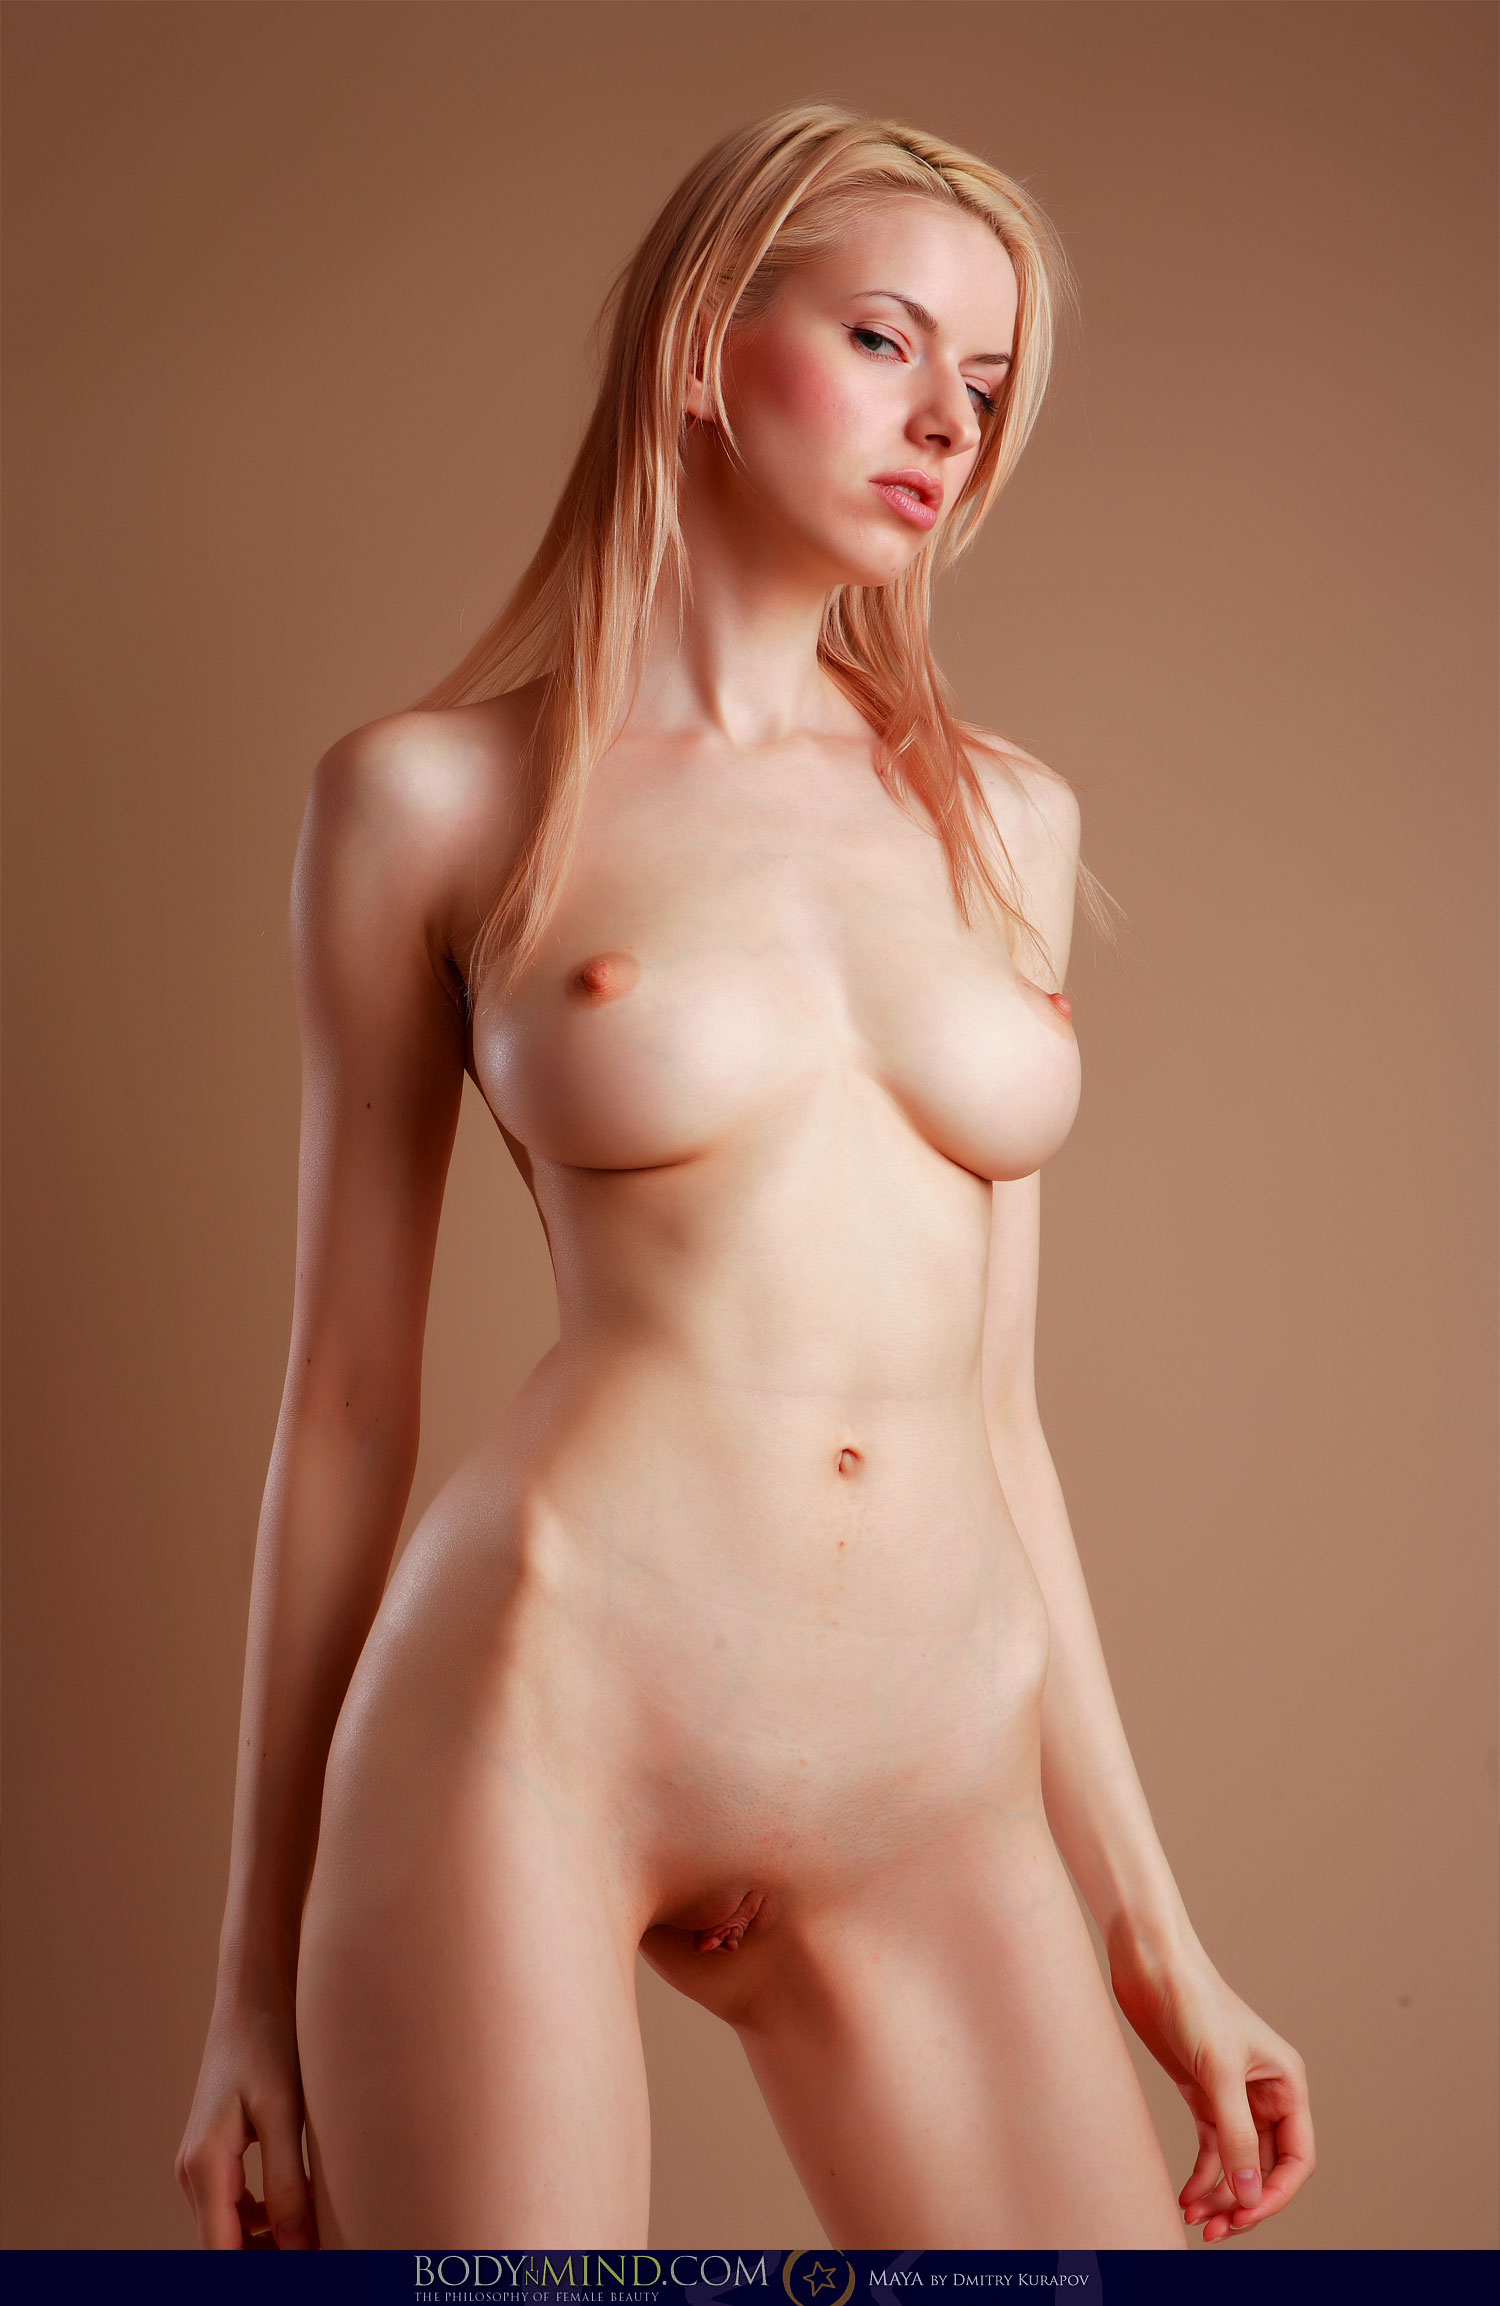 Model gril body sex